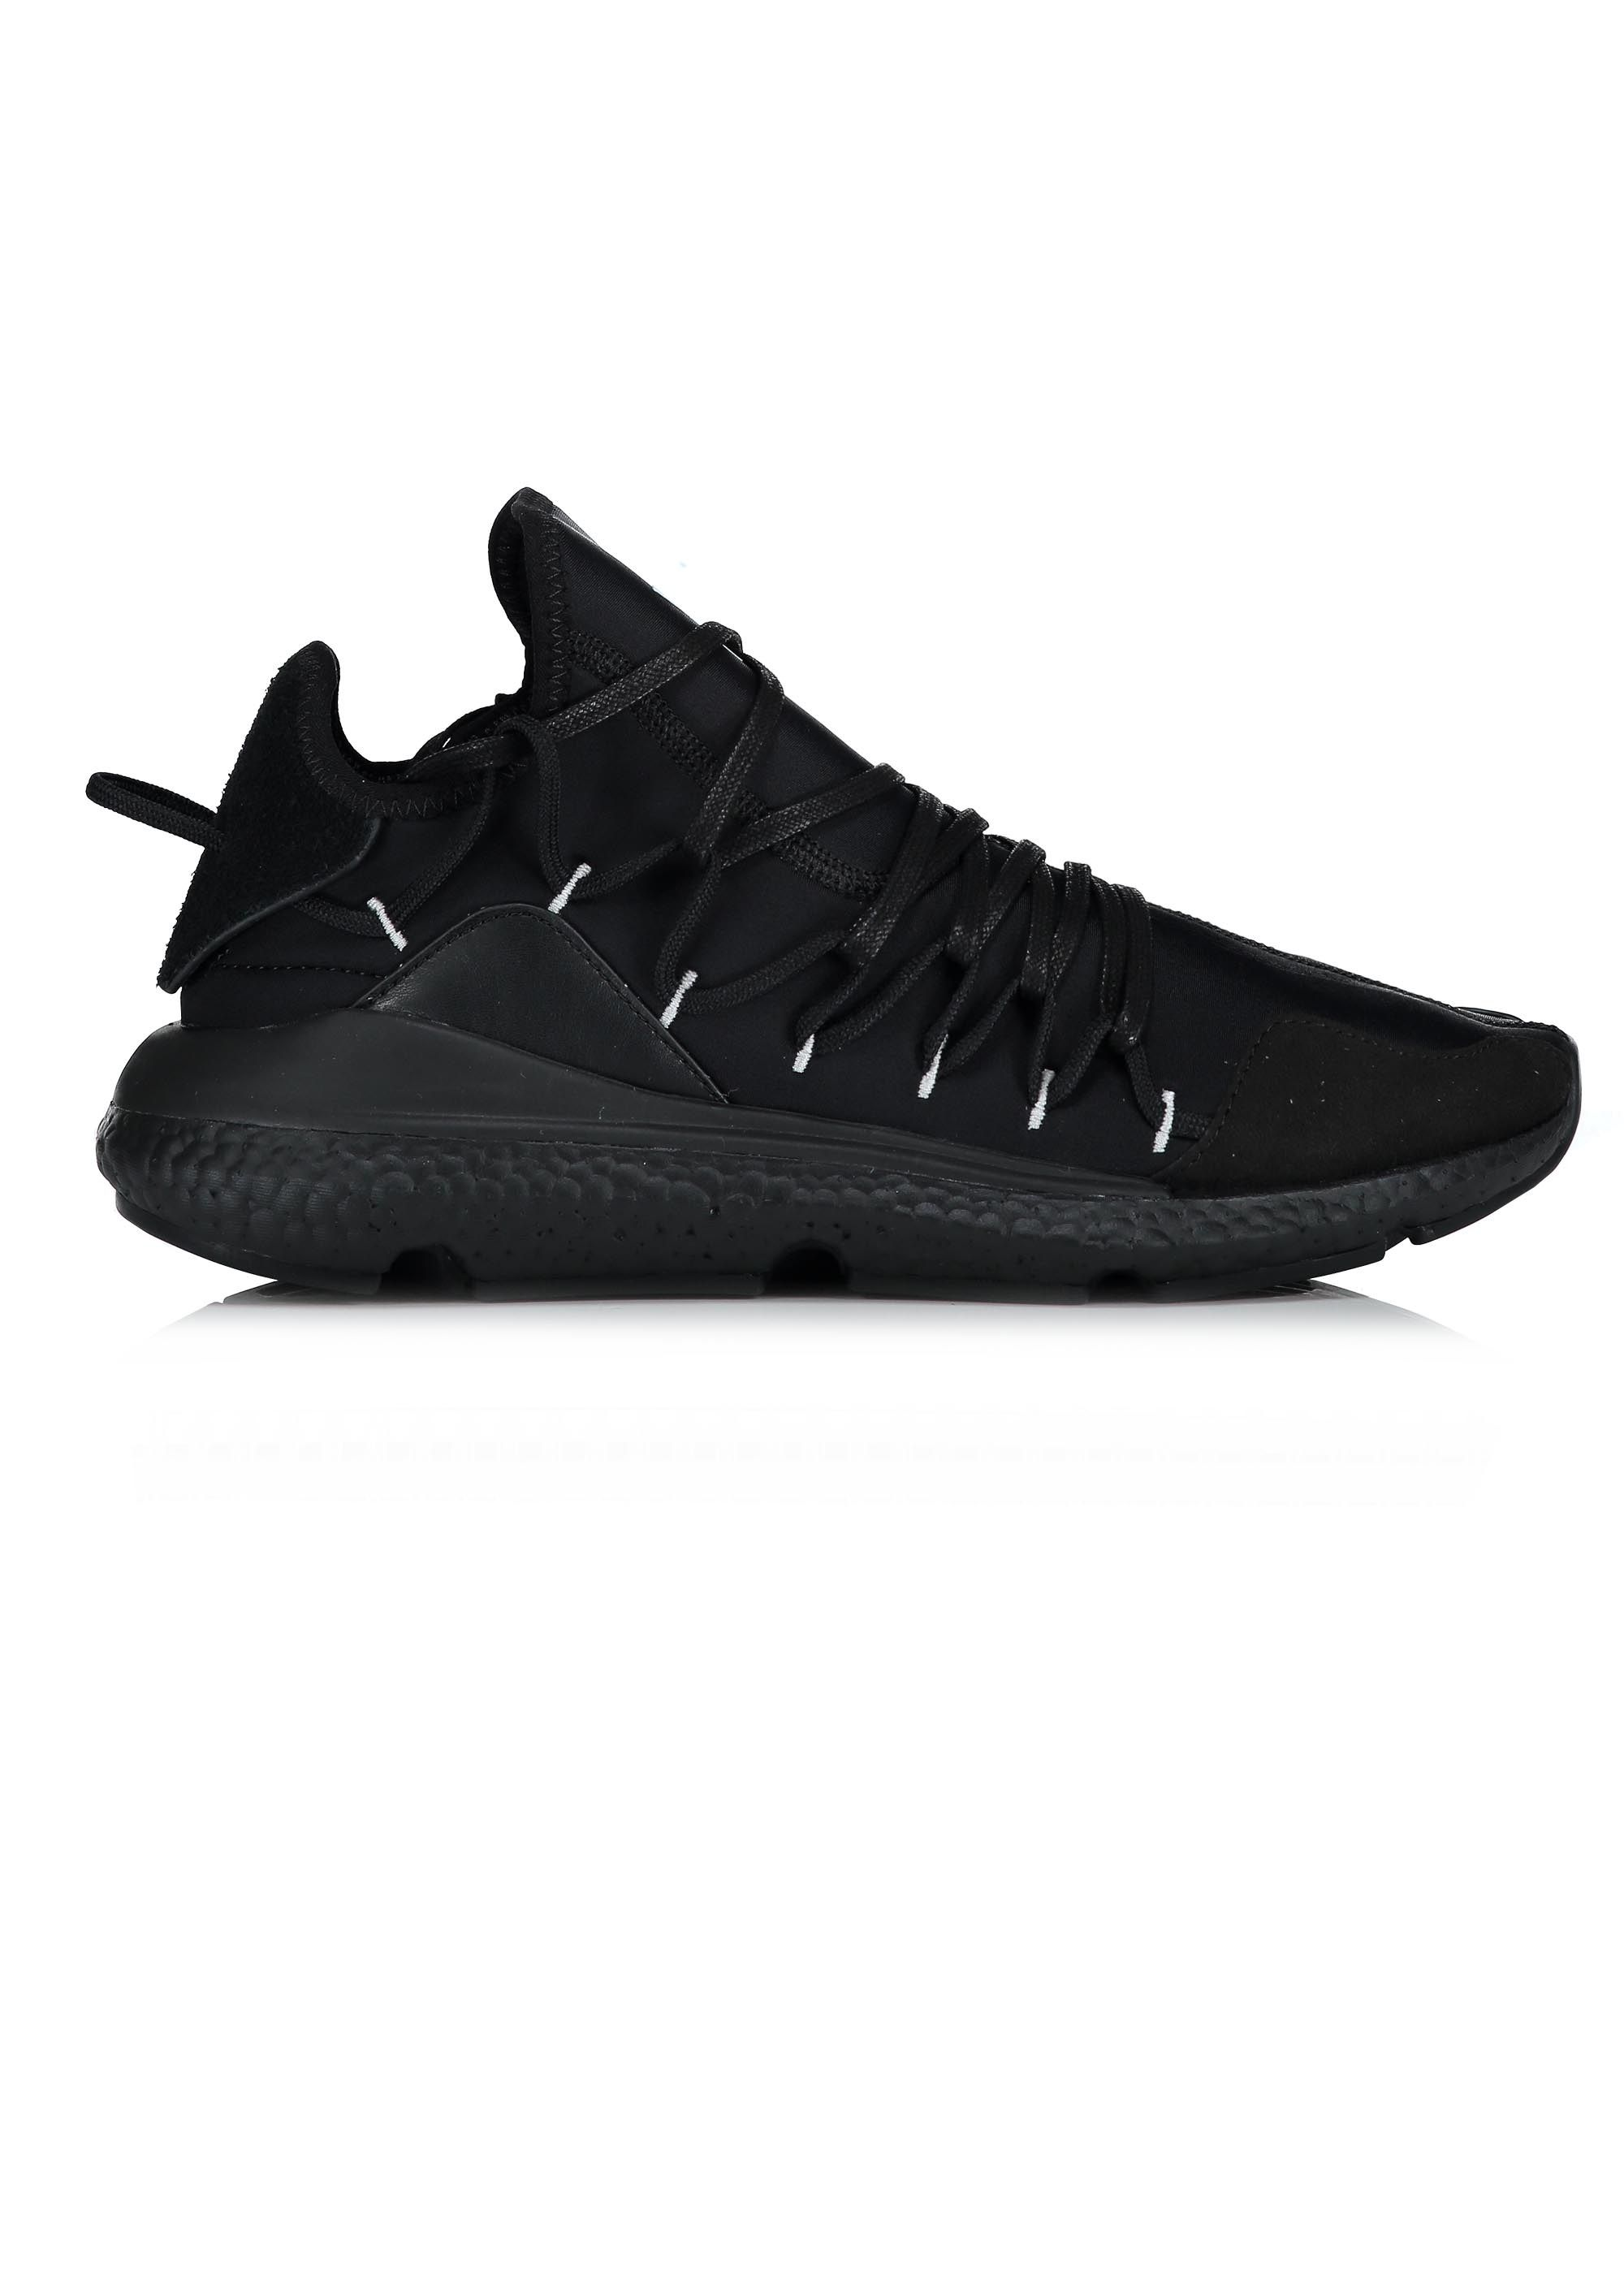 Kusari Trainers - Black | Black, Y 3